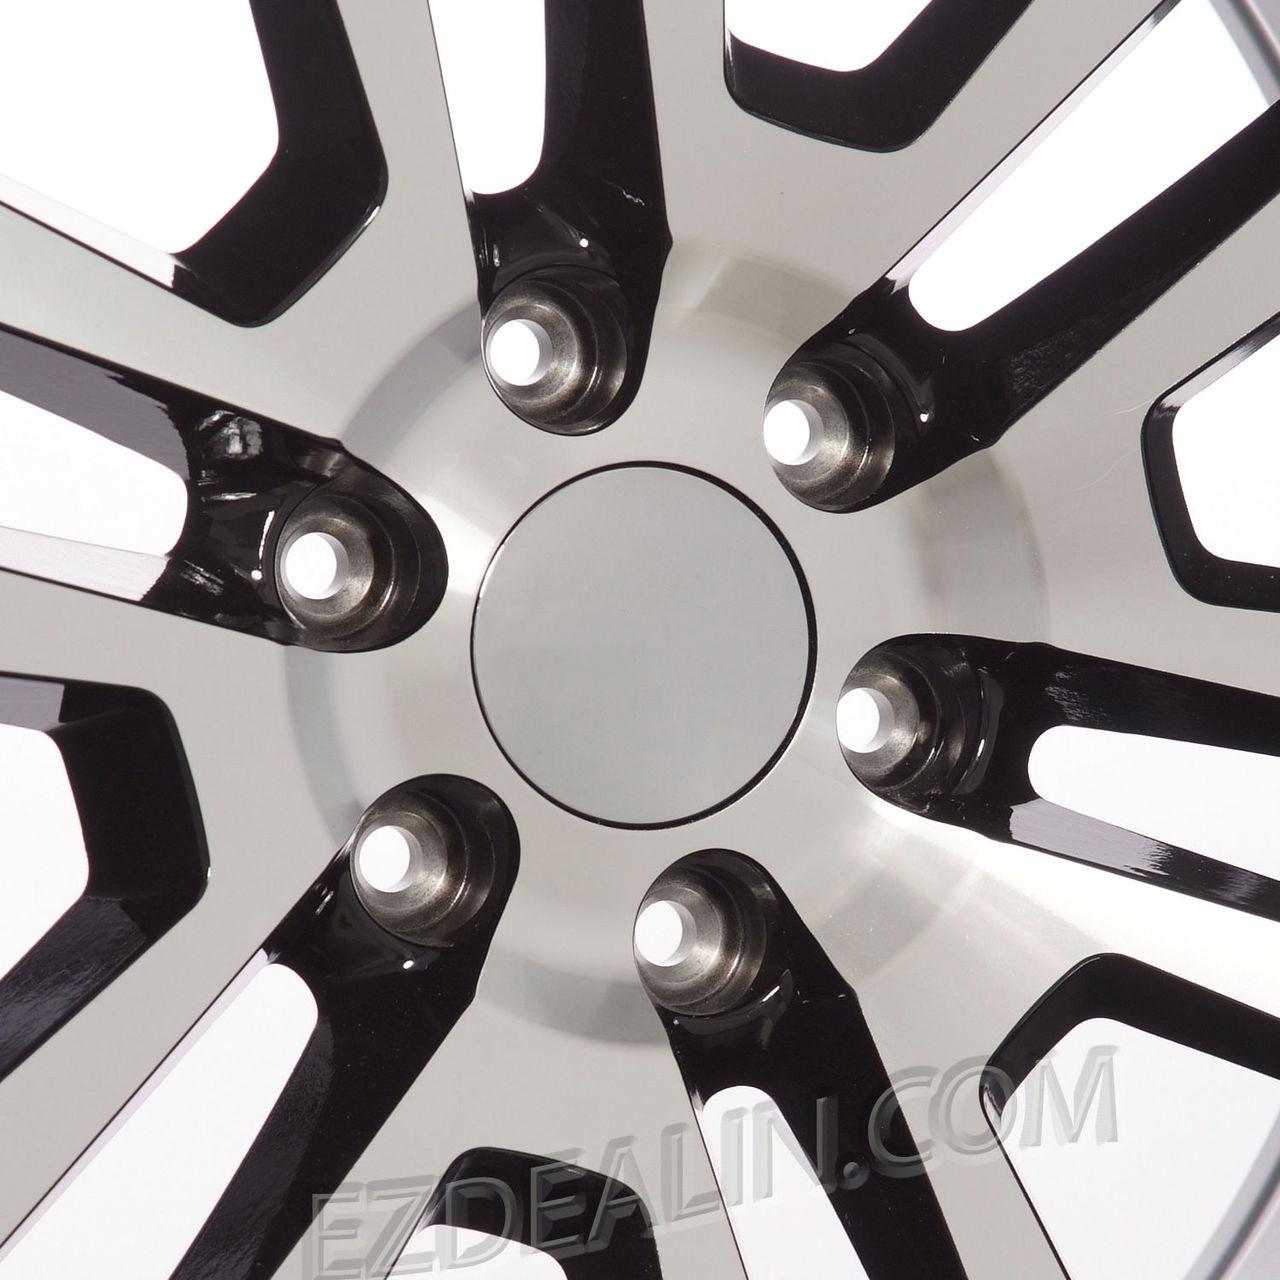 "Black and Machine 22"" Split Spoke Wheels for GMC Sierra, Yukon, Denali - New Set of 4"